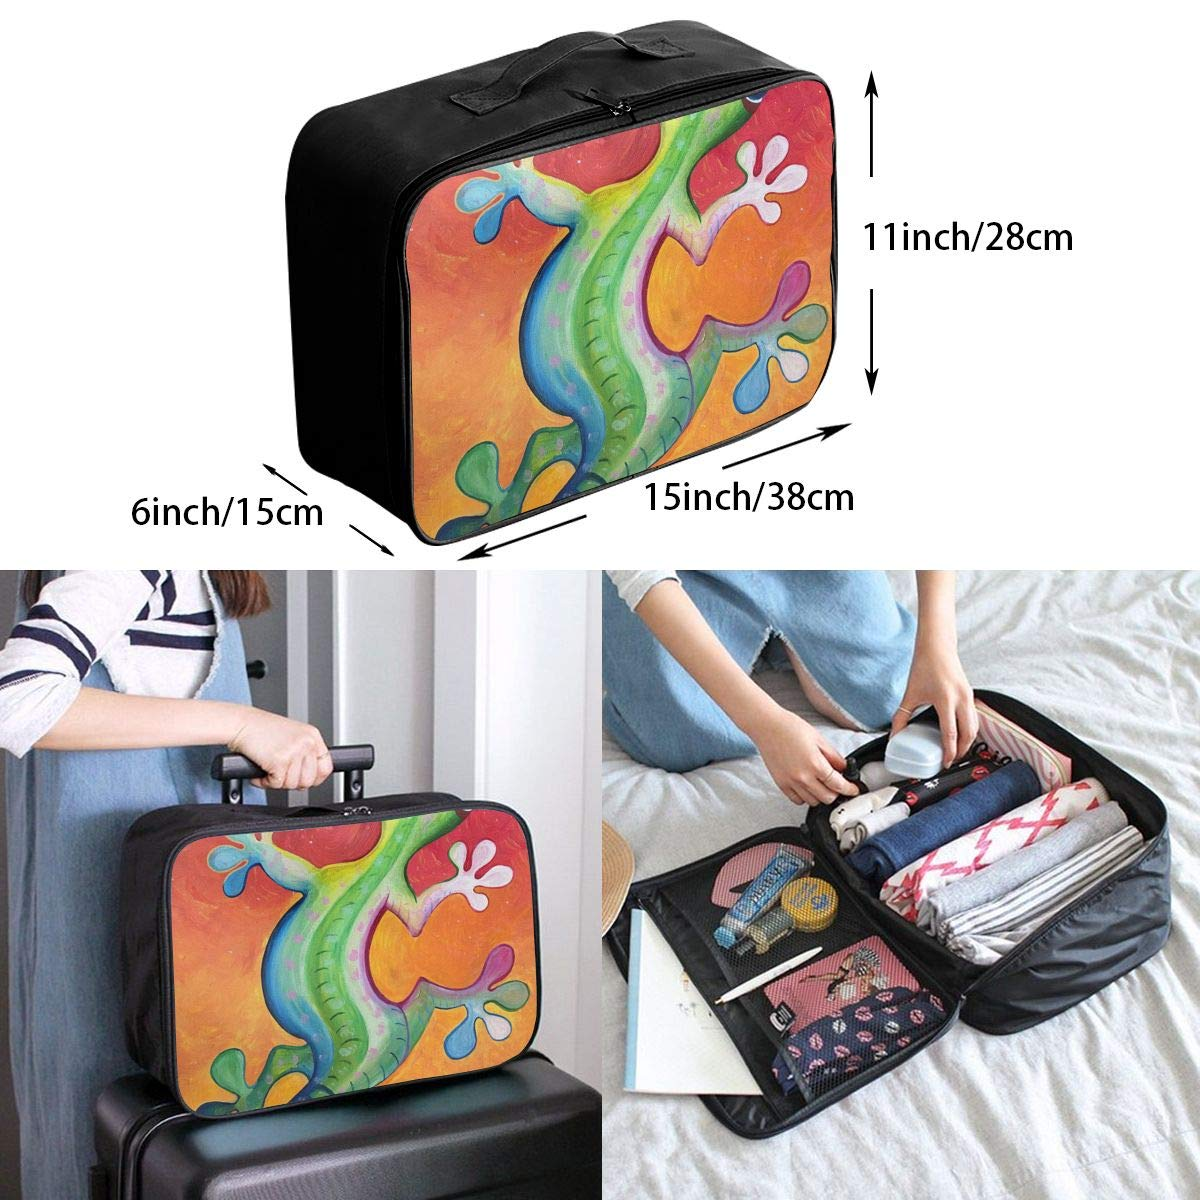 Travel Luggage Duffle Bag Lightweight Portable Handbag Gecko Oil Painting Large Capacity Waterproof Foldable Storage Tote